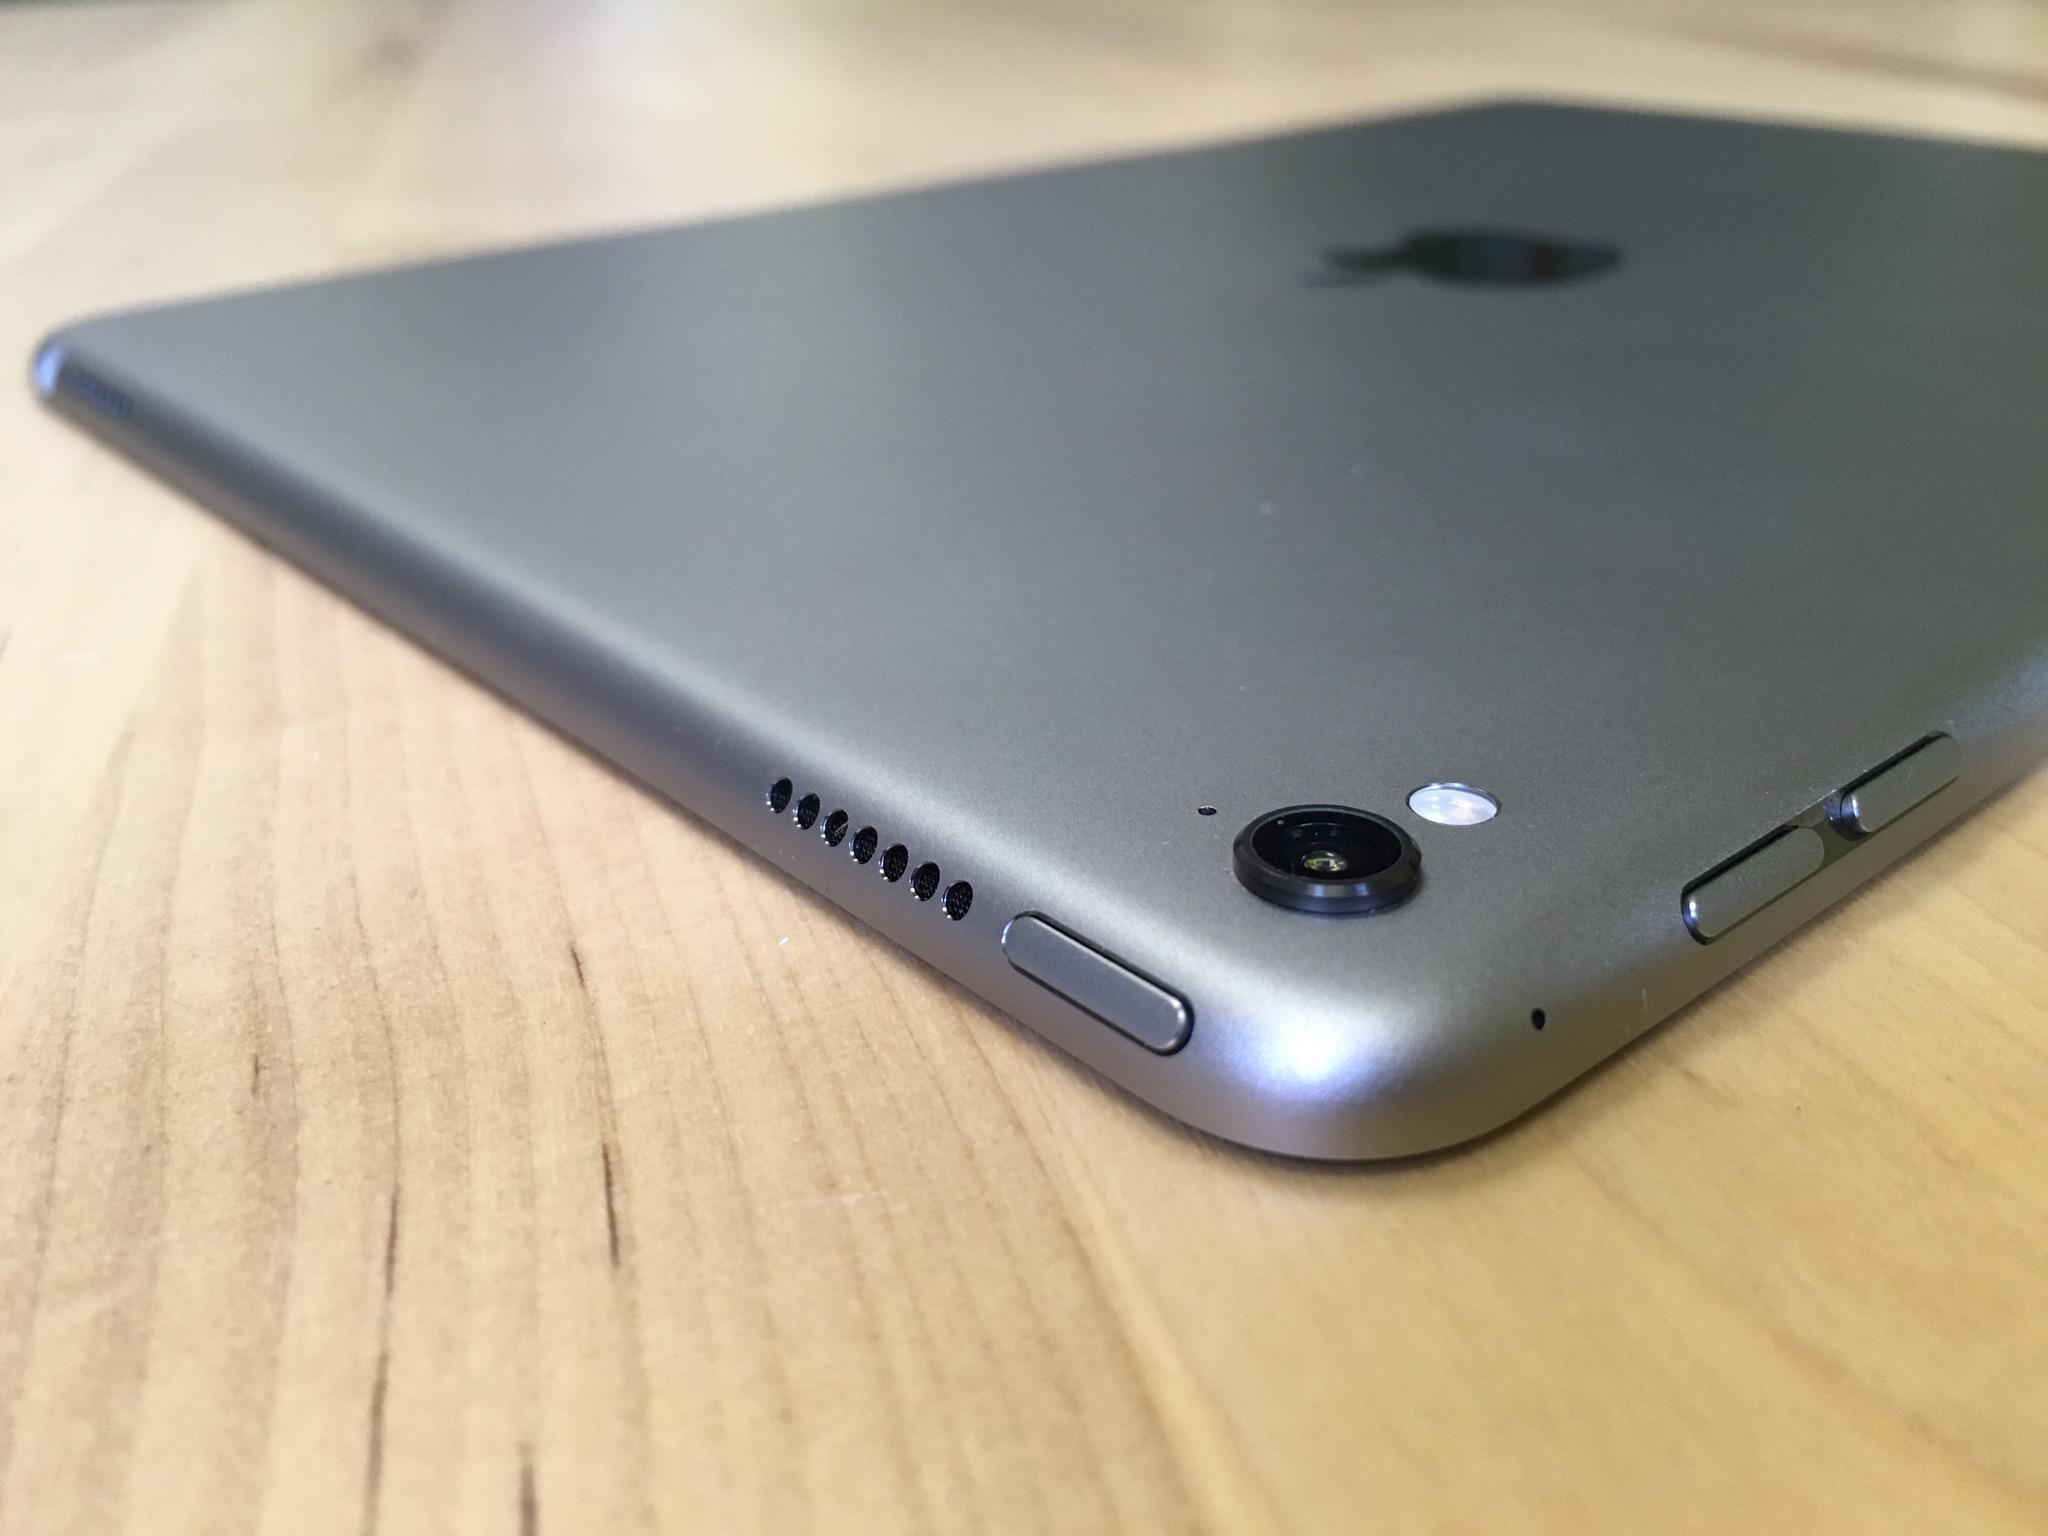 The camera bump on the 9.7-inch iPad Pro.